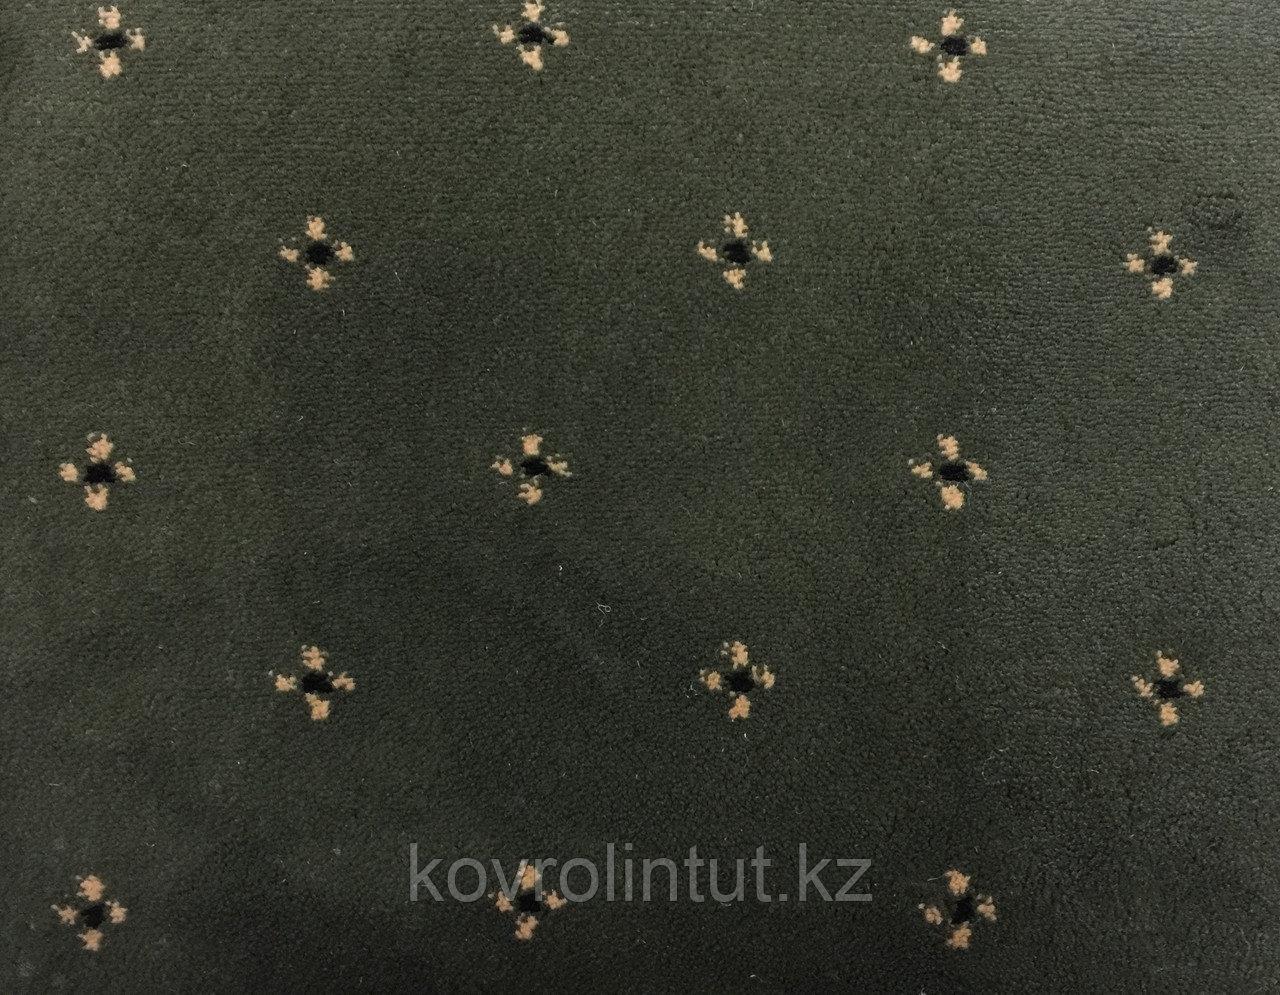 Ковролин (ковролан) Boston Heat Set  100% PP 25118-310 4,0м опт/розн